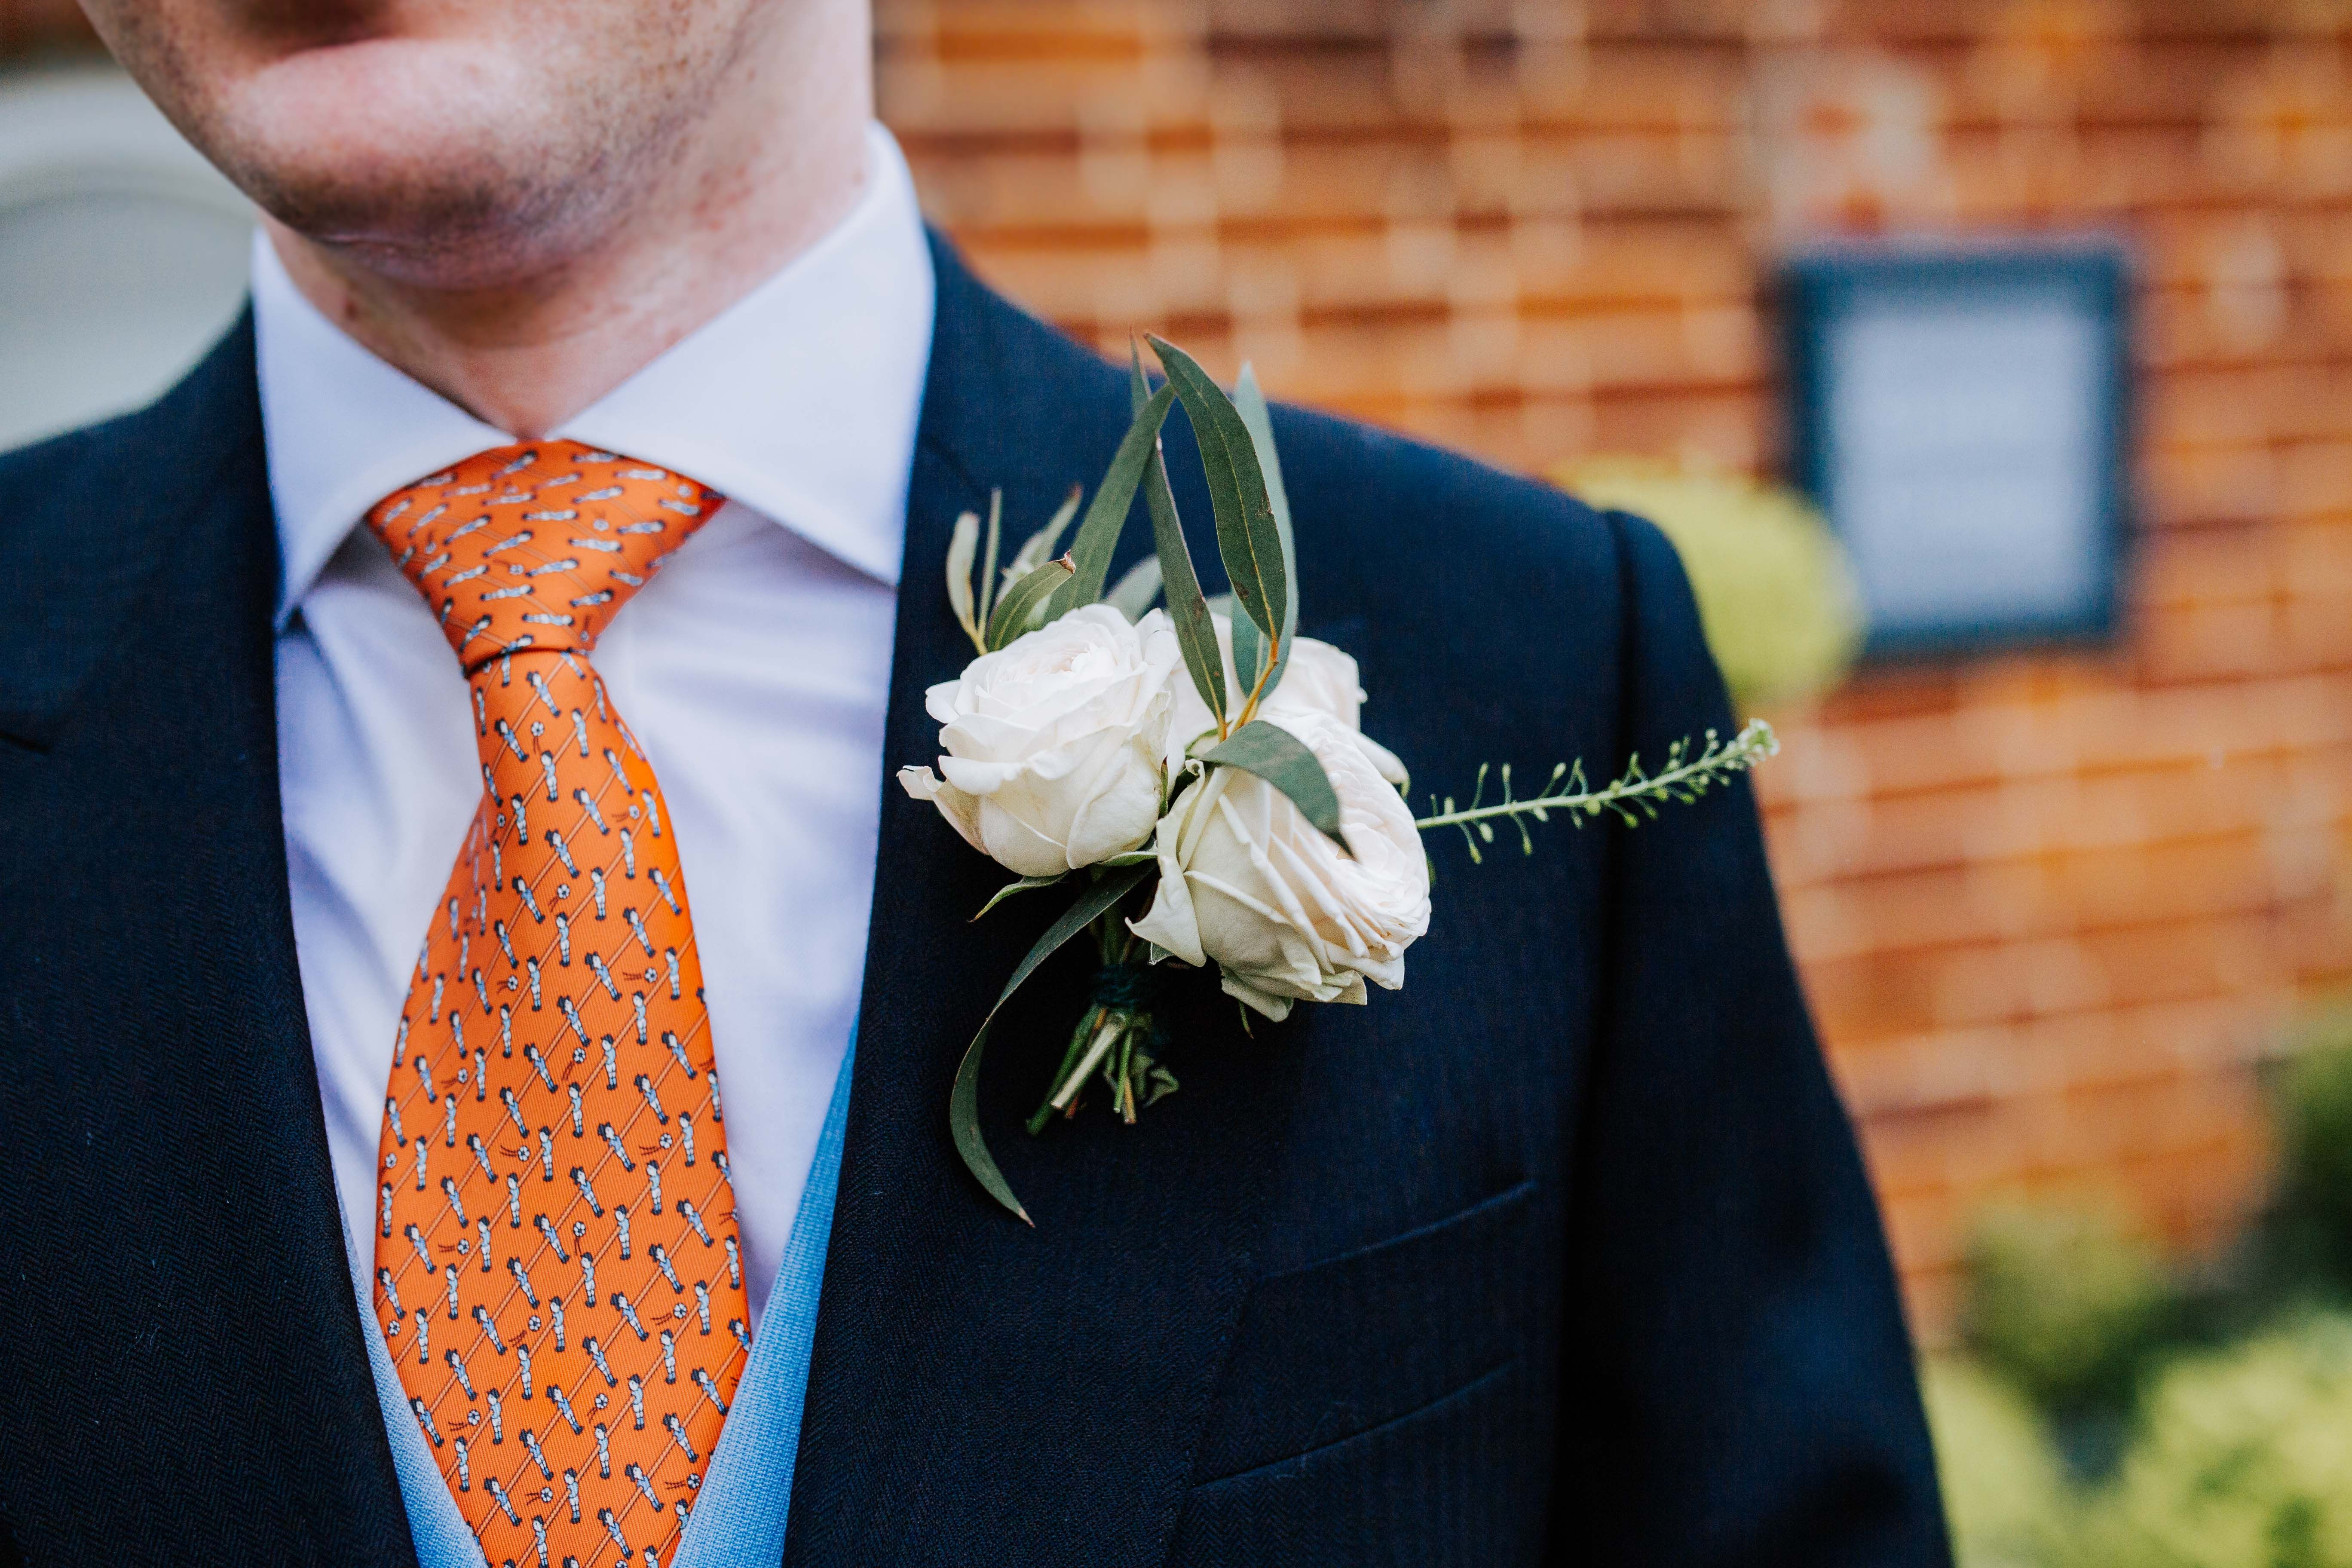 35d0cc76524e Groom wedding style // Hermes orange tie and beautiful double flower  buttonhole / boutonniere.